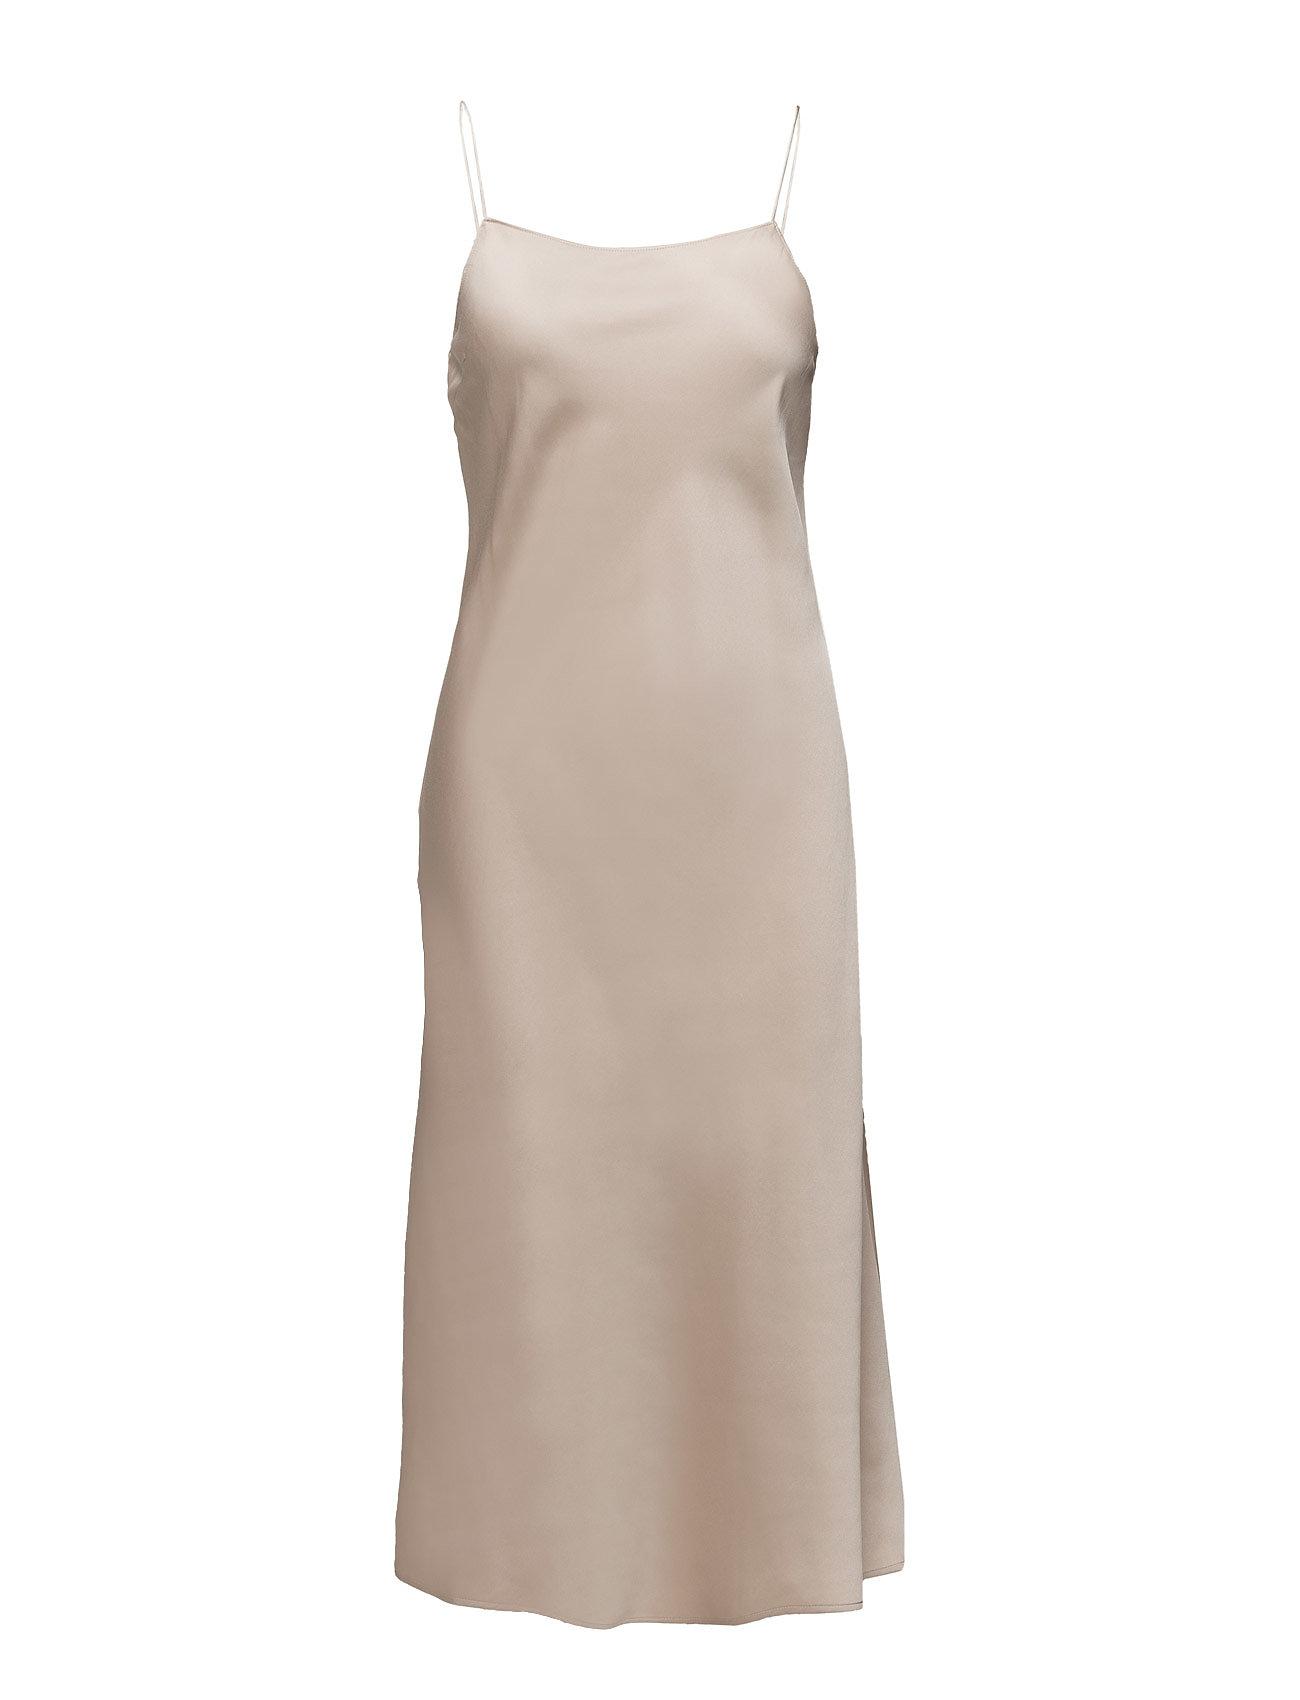 Filippa K Slinky Slip Dress